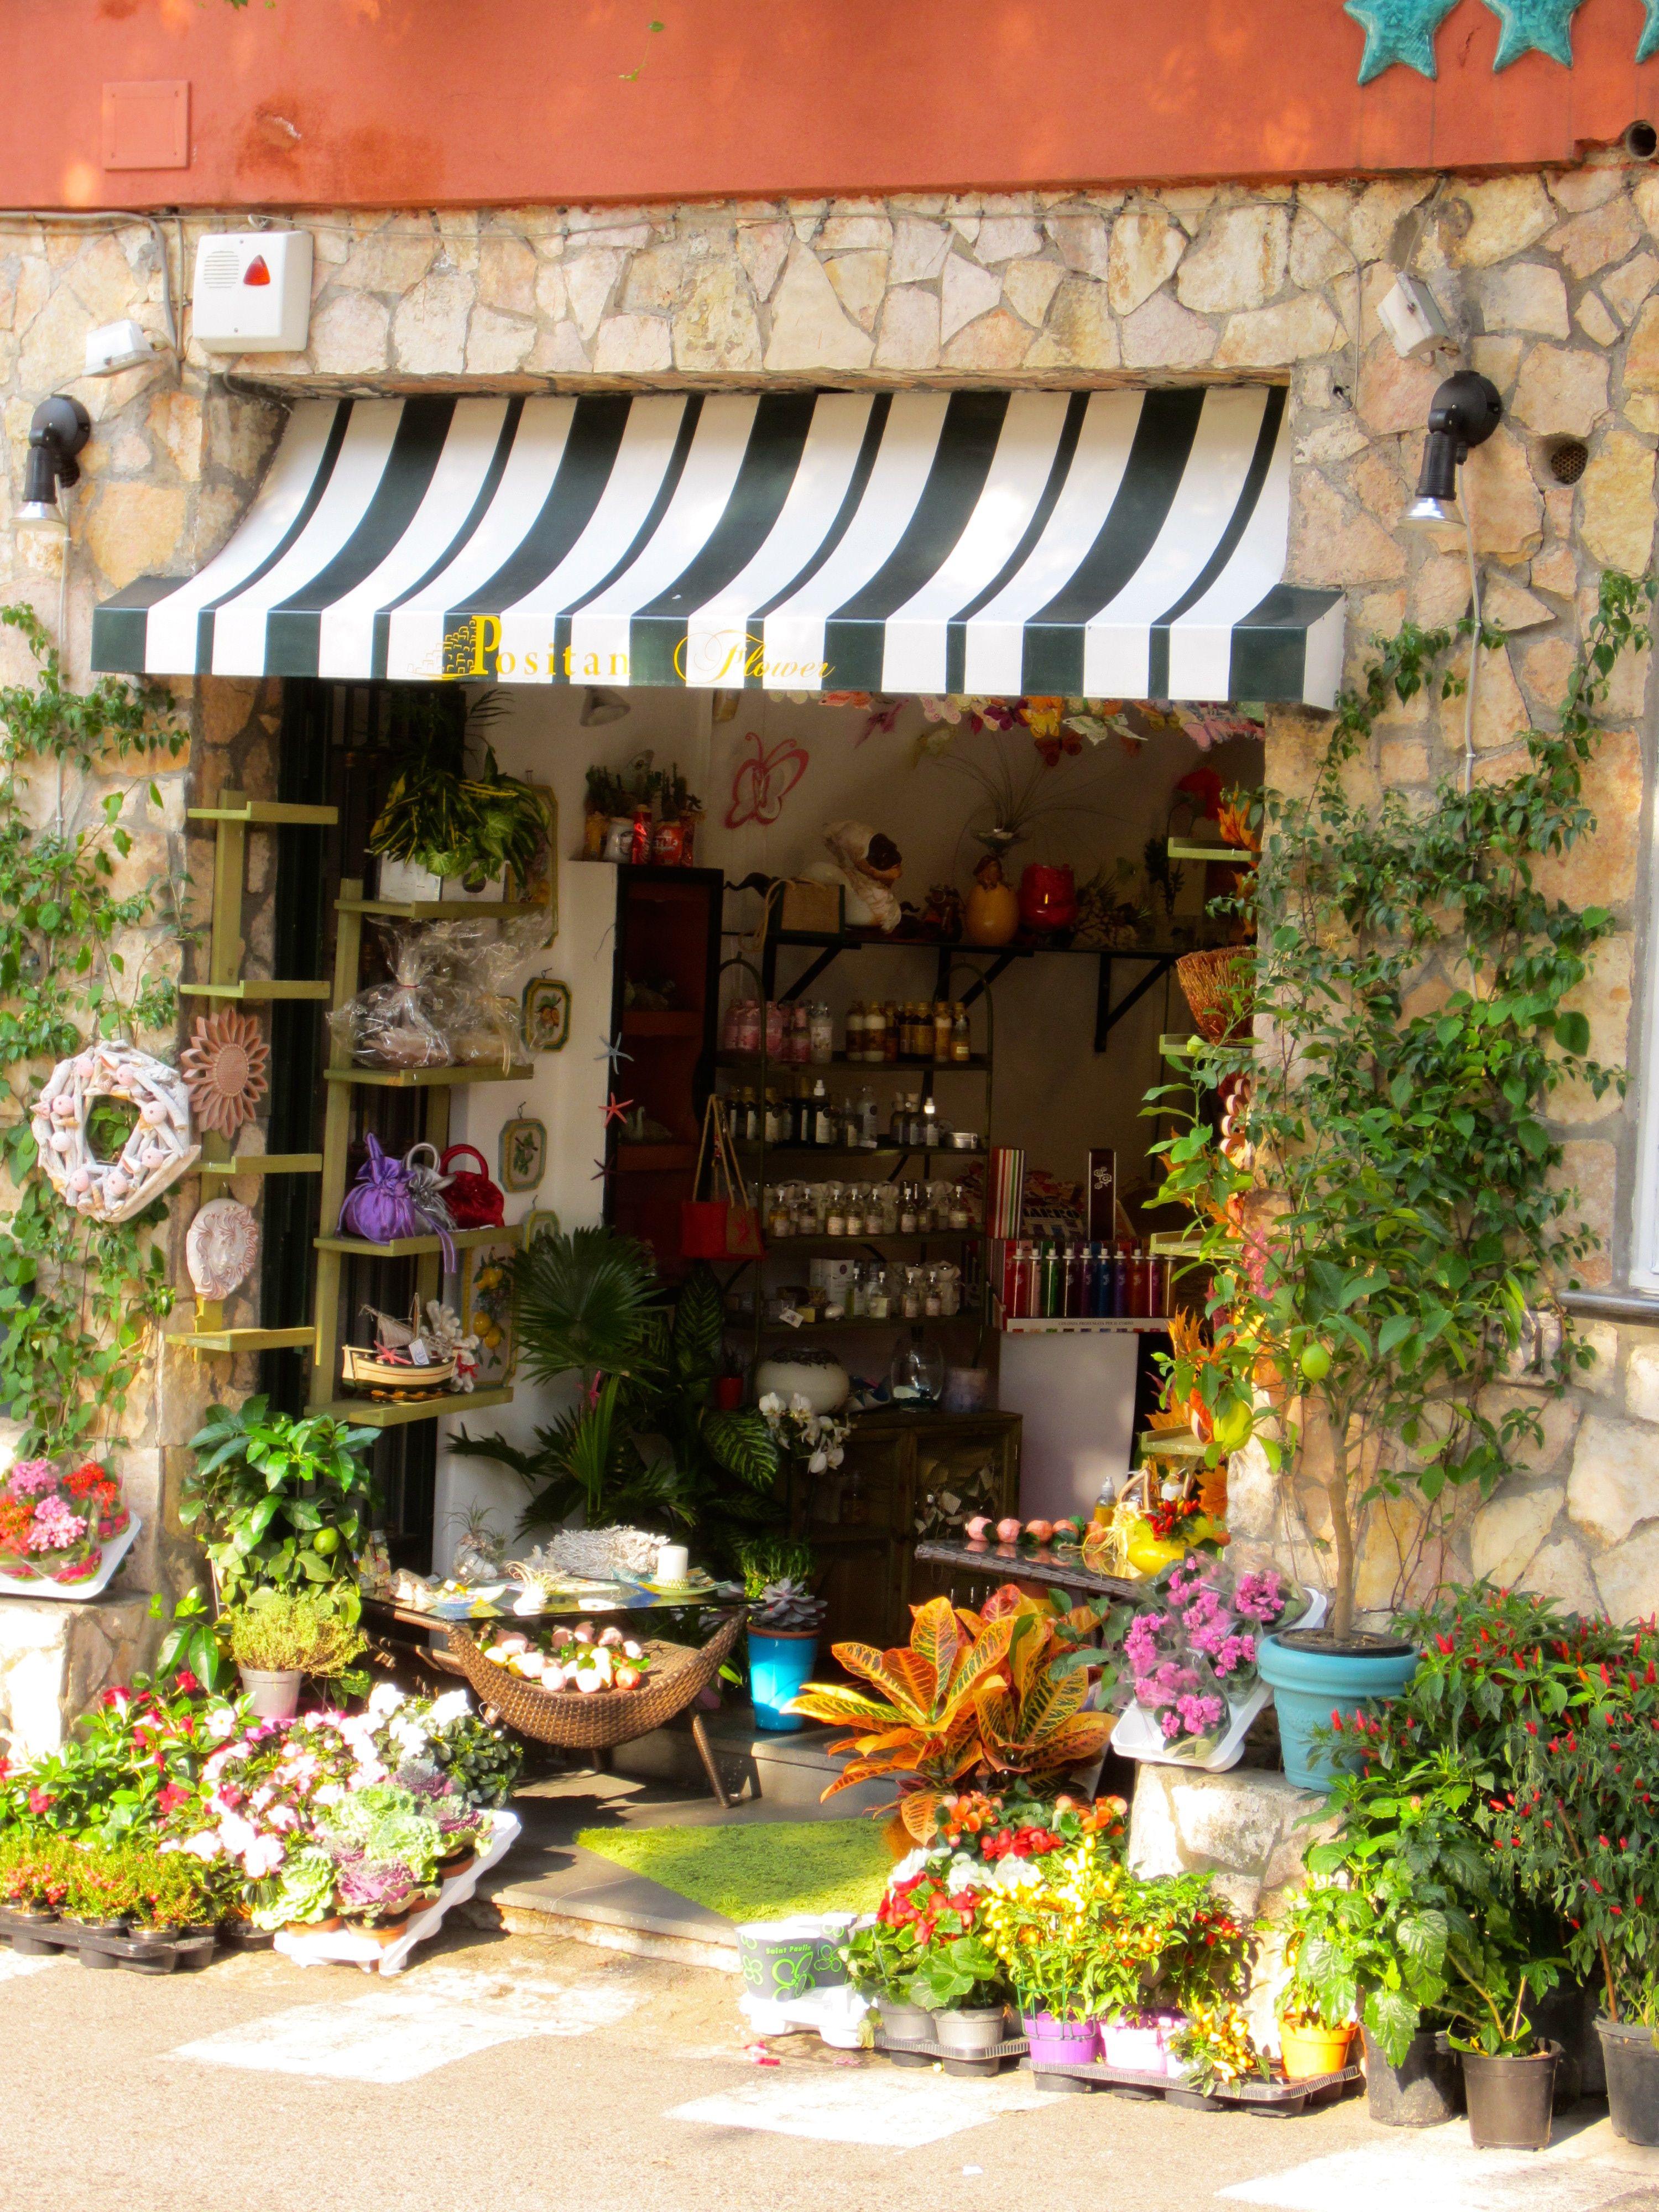 Positano florist italy the little store pinterest positano positano florist italy positano italybeautiful placesbeautiful flowersstore izmirmasajfo Gallery